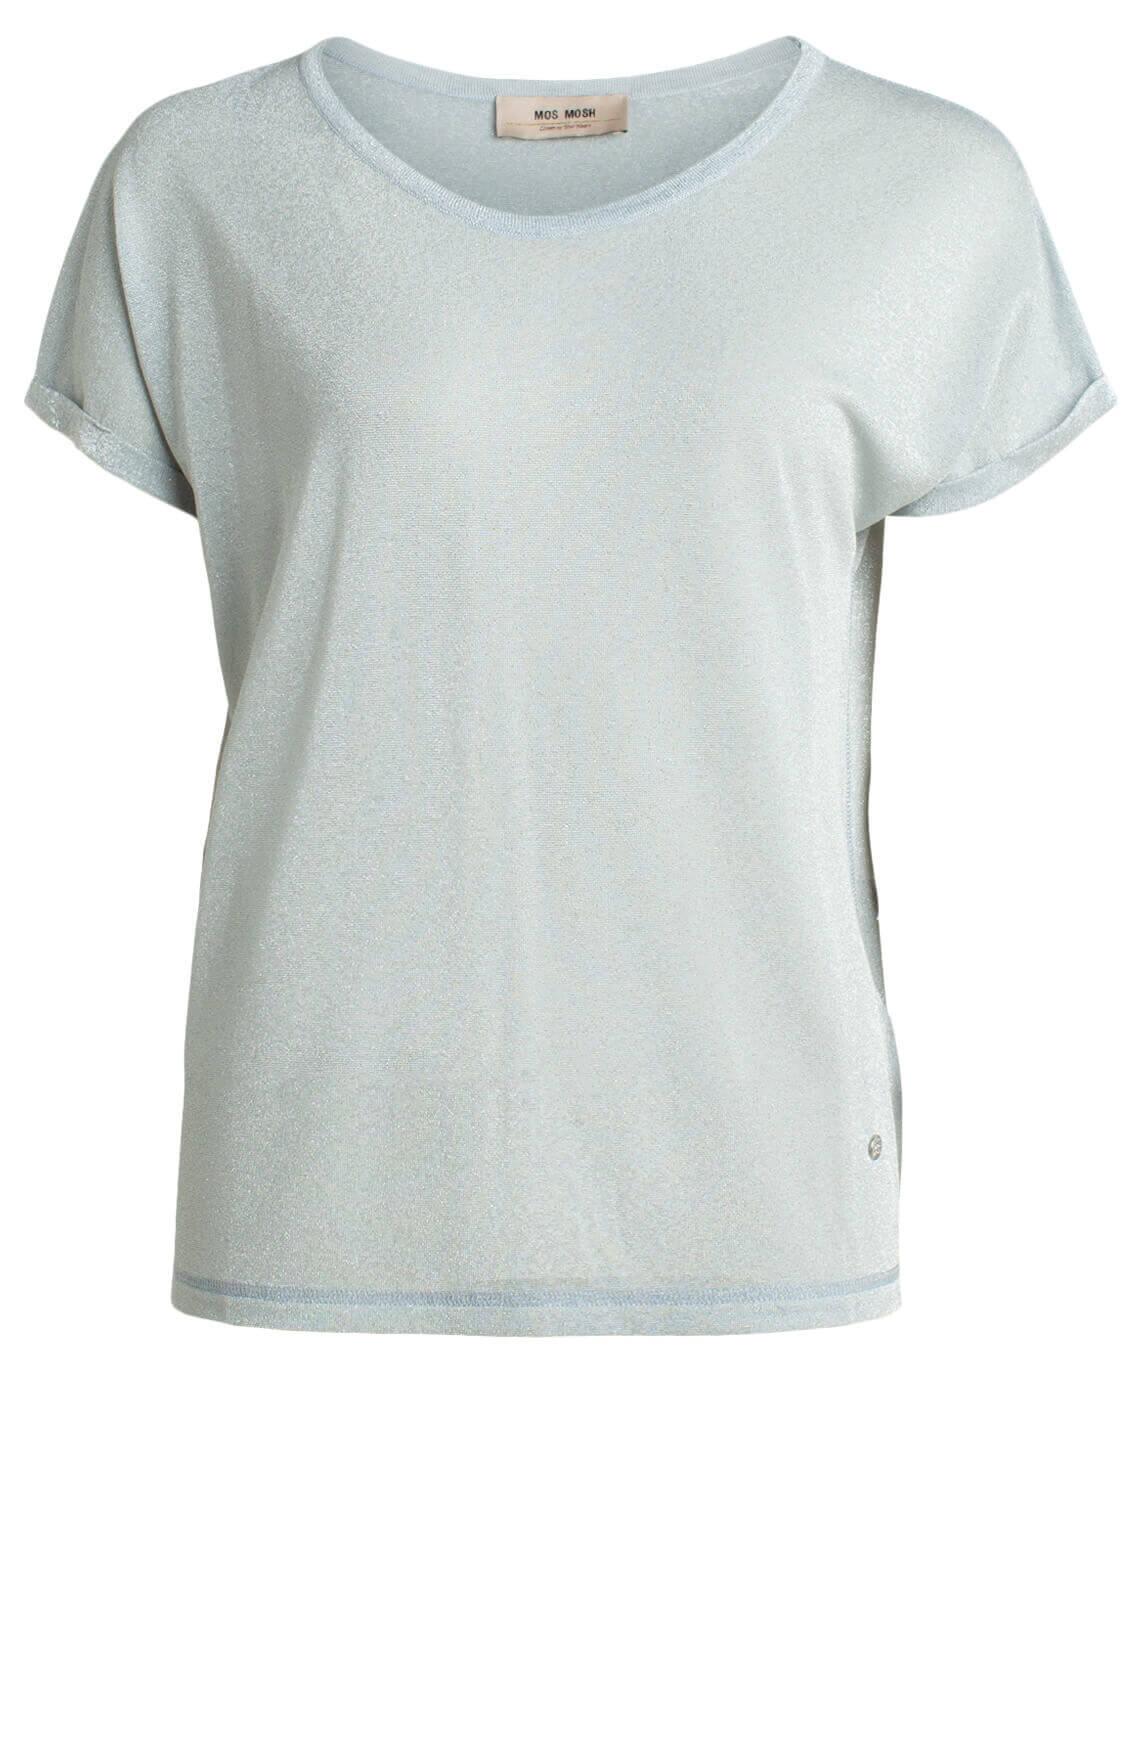 Mos Mosh Dames Kay glitter shirt Blauw